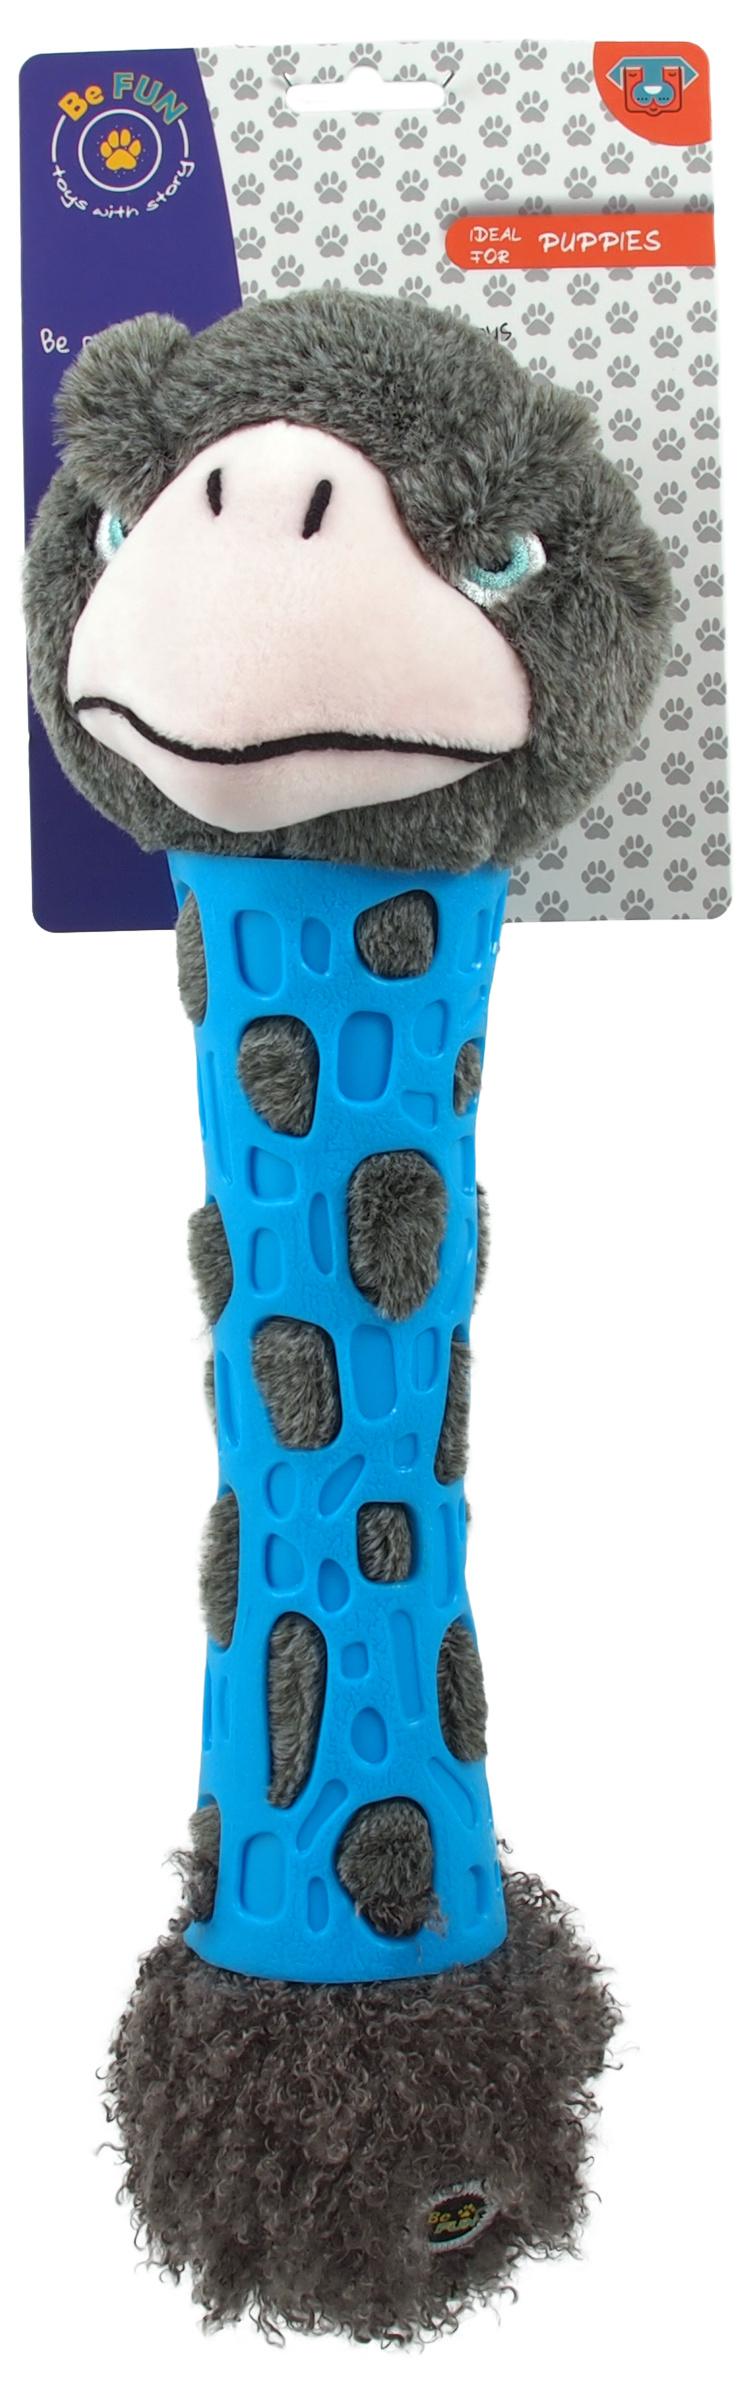 Игрушка для собак – Be Fun TPR toy + Plush Ostrich, 38 см